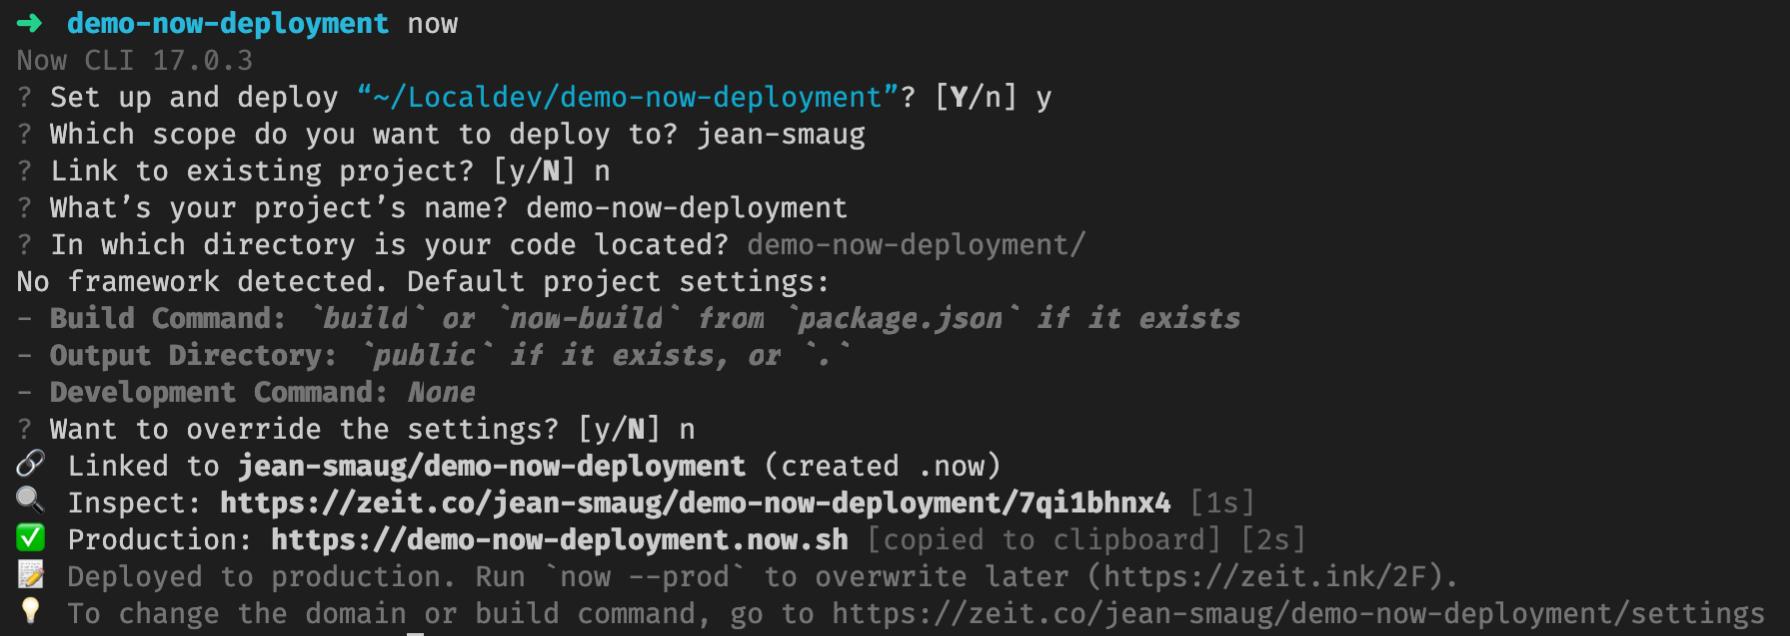 now-cli-deployment